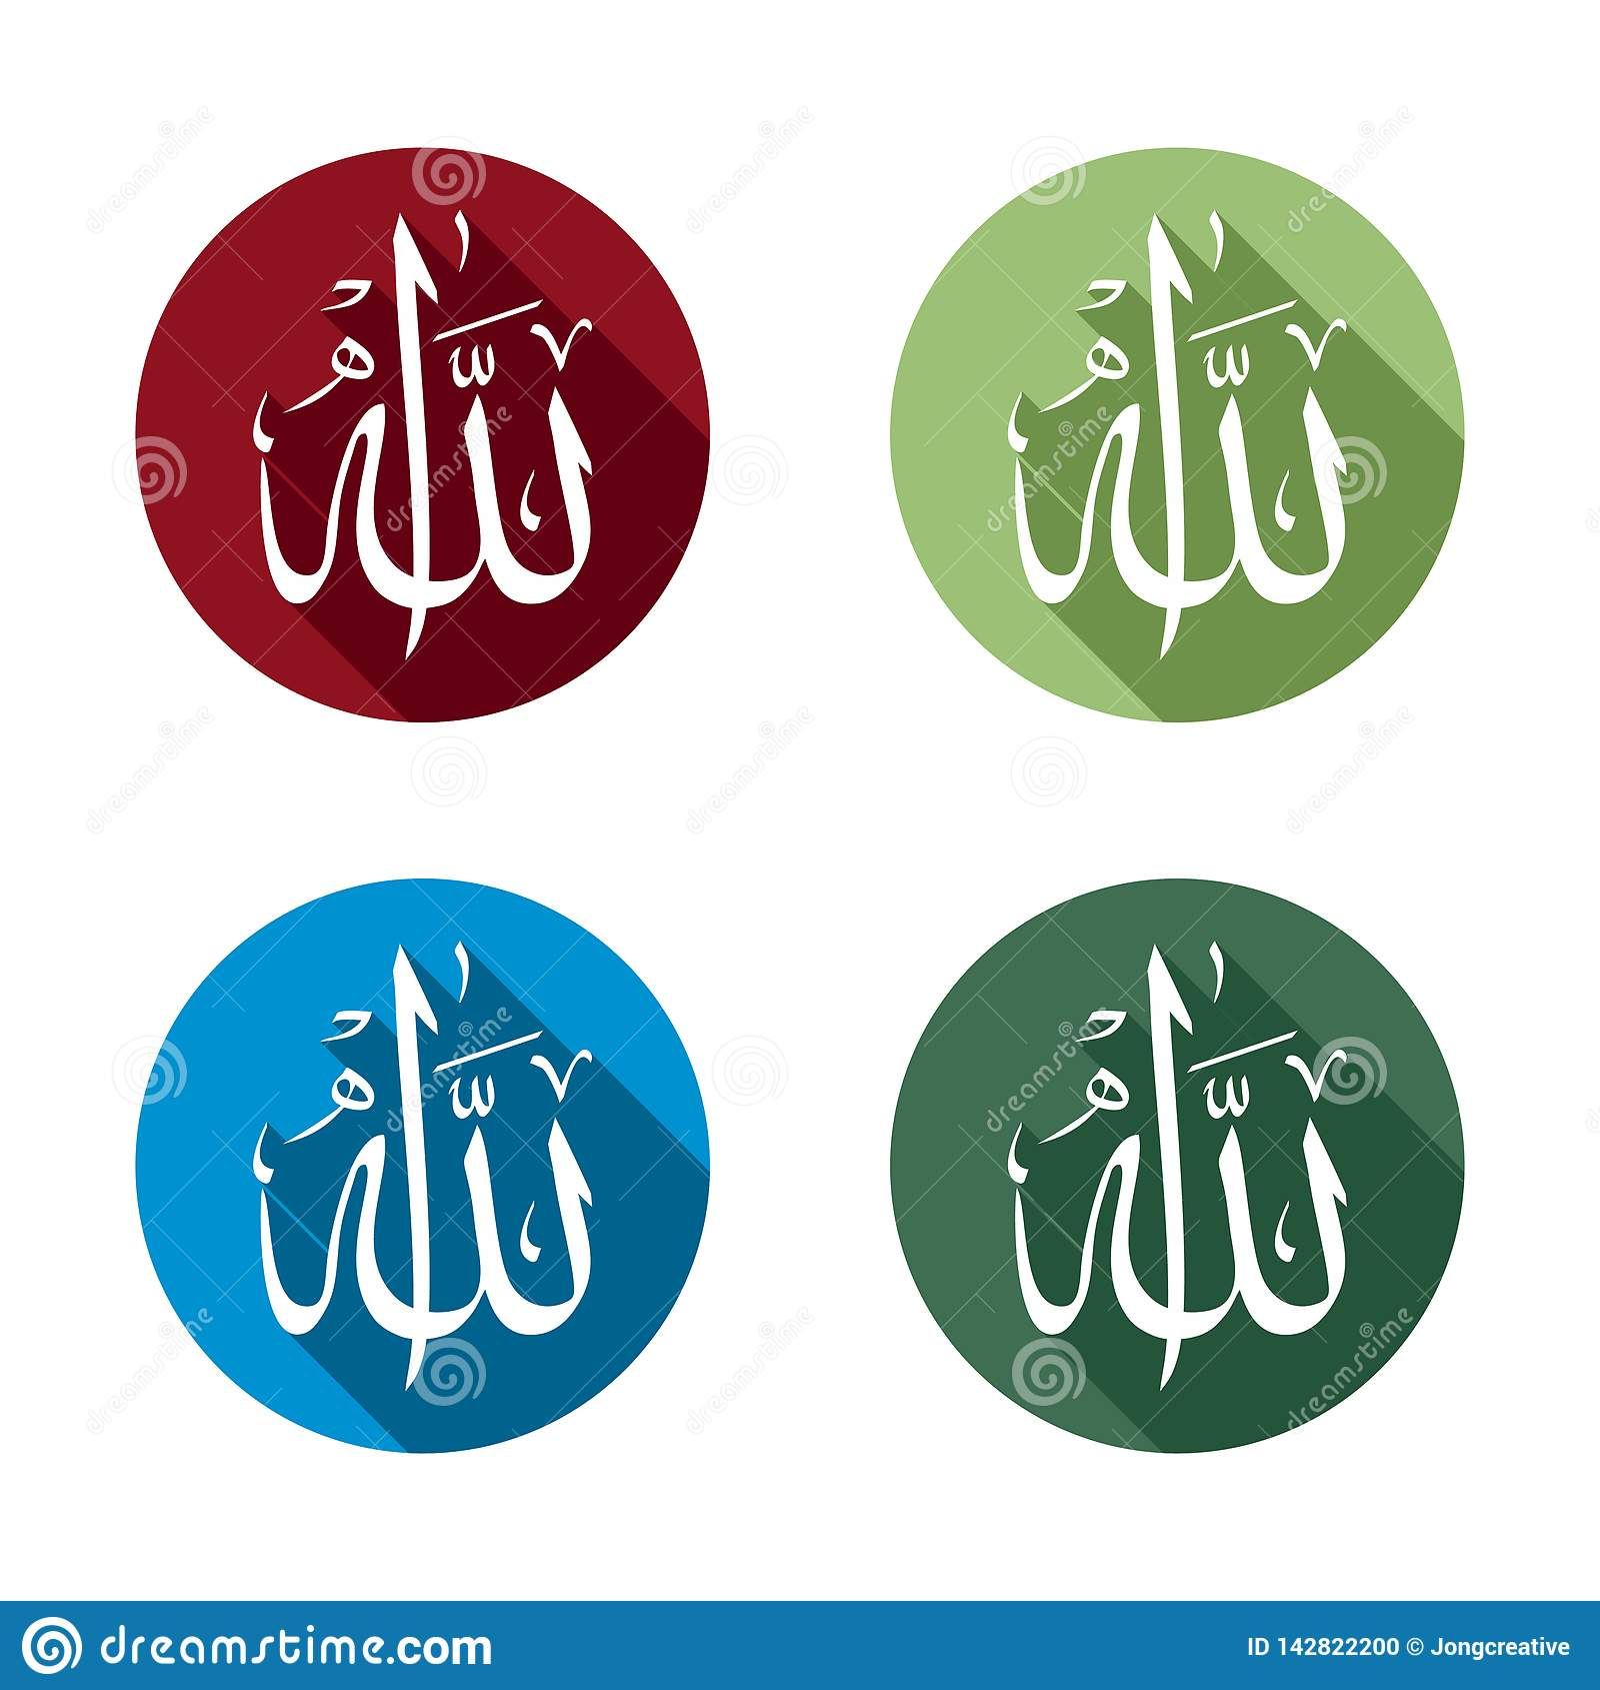 Allah In Arabic Calligraphy Writing Circle Illustration